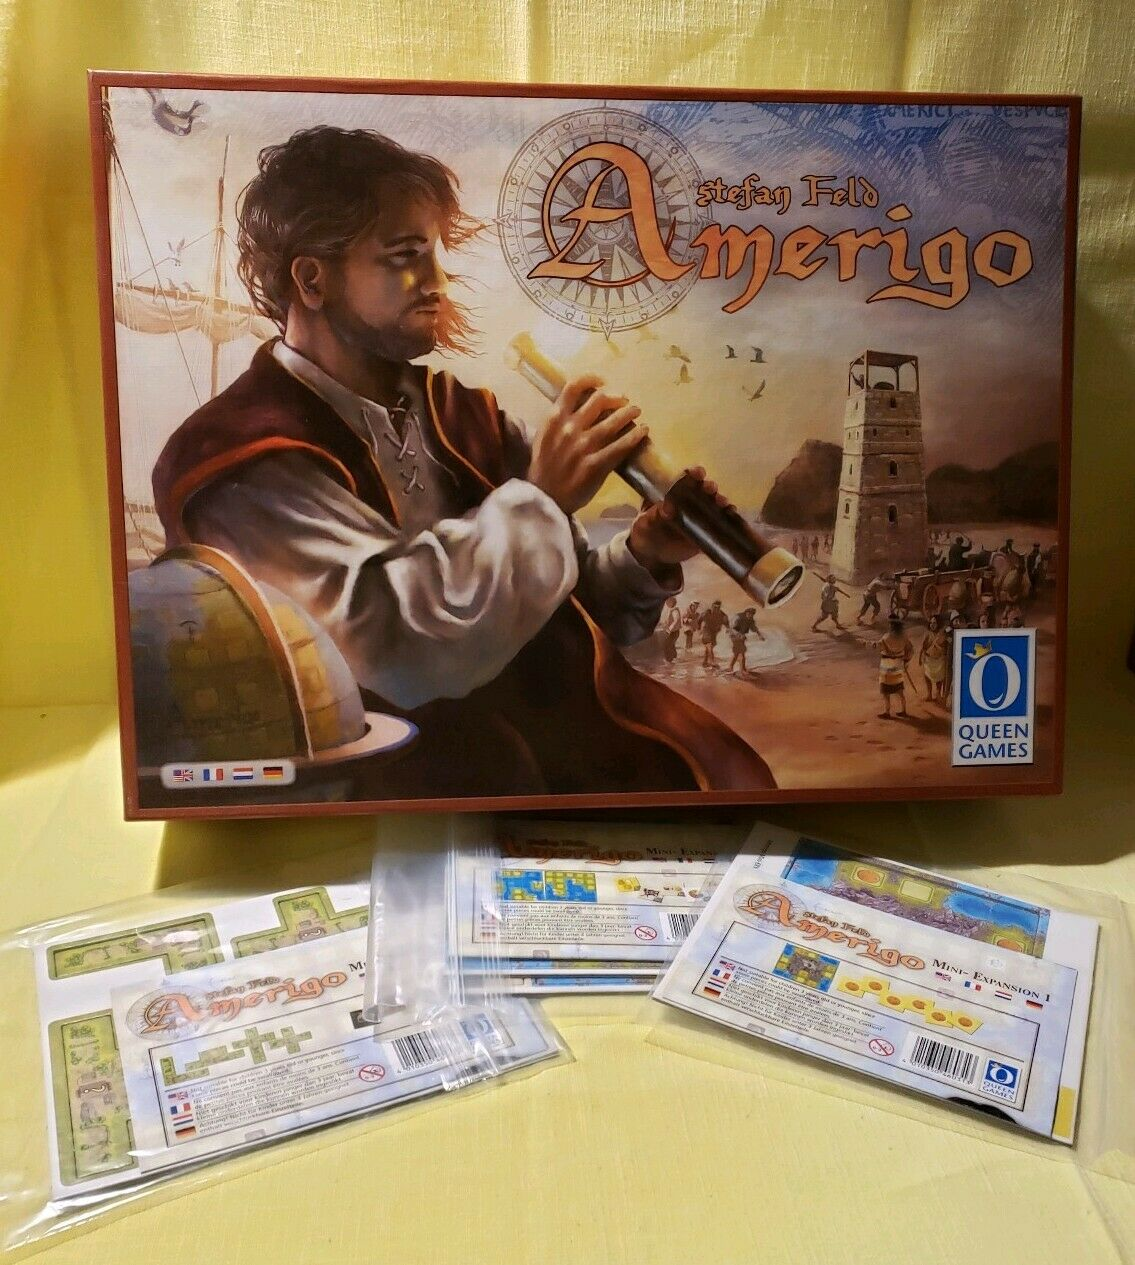 AMERIGO + 3 QUEENIES = ALL 3 Mini Expansions Boardgame QUEEN Games Stephan Feld